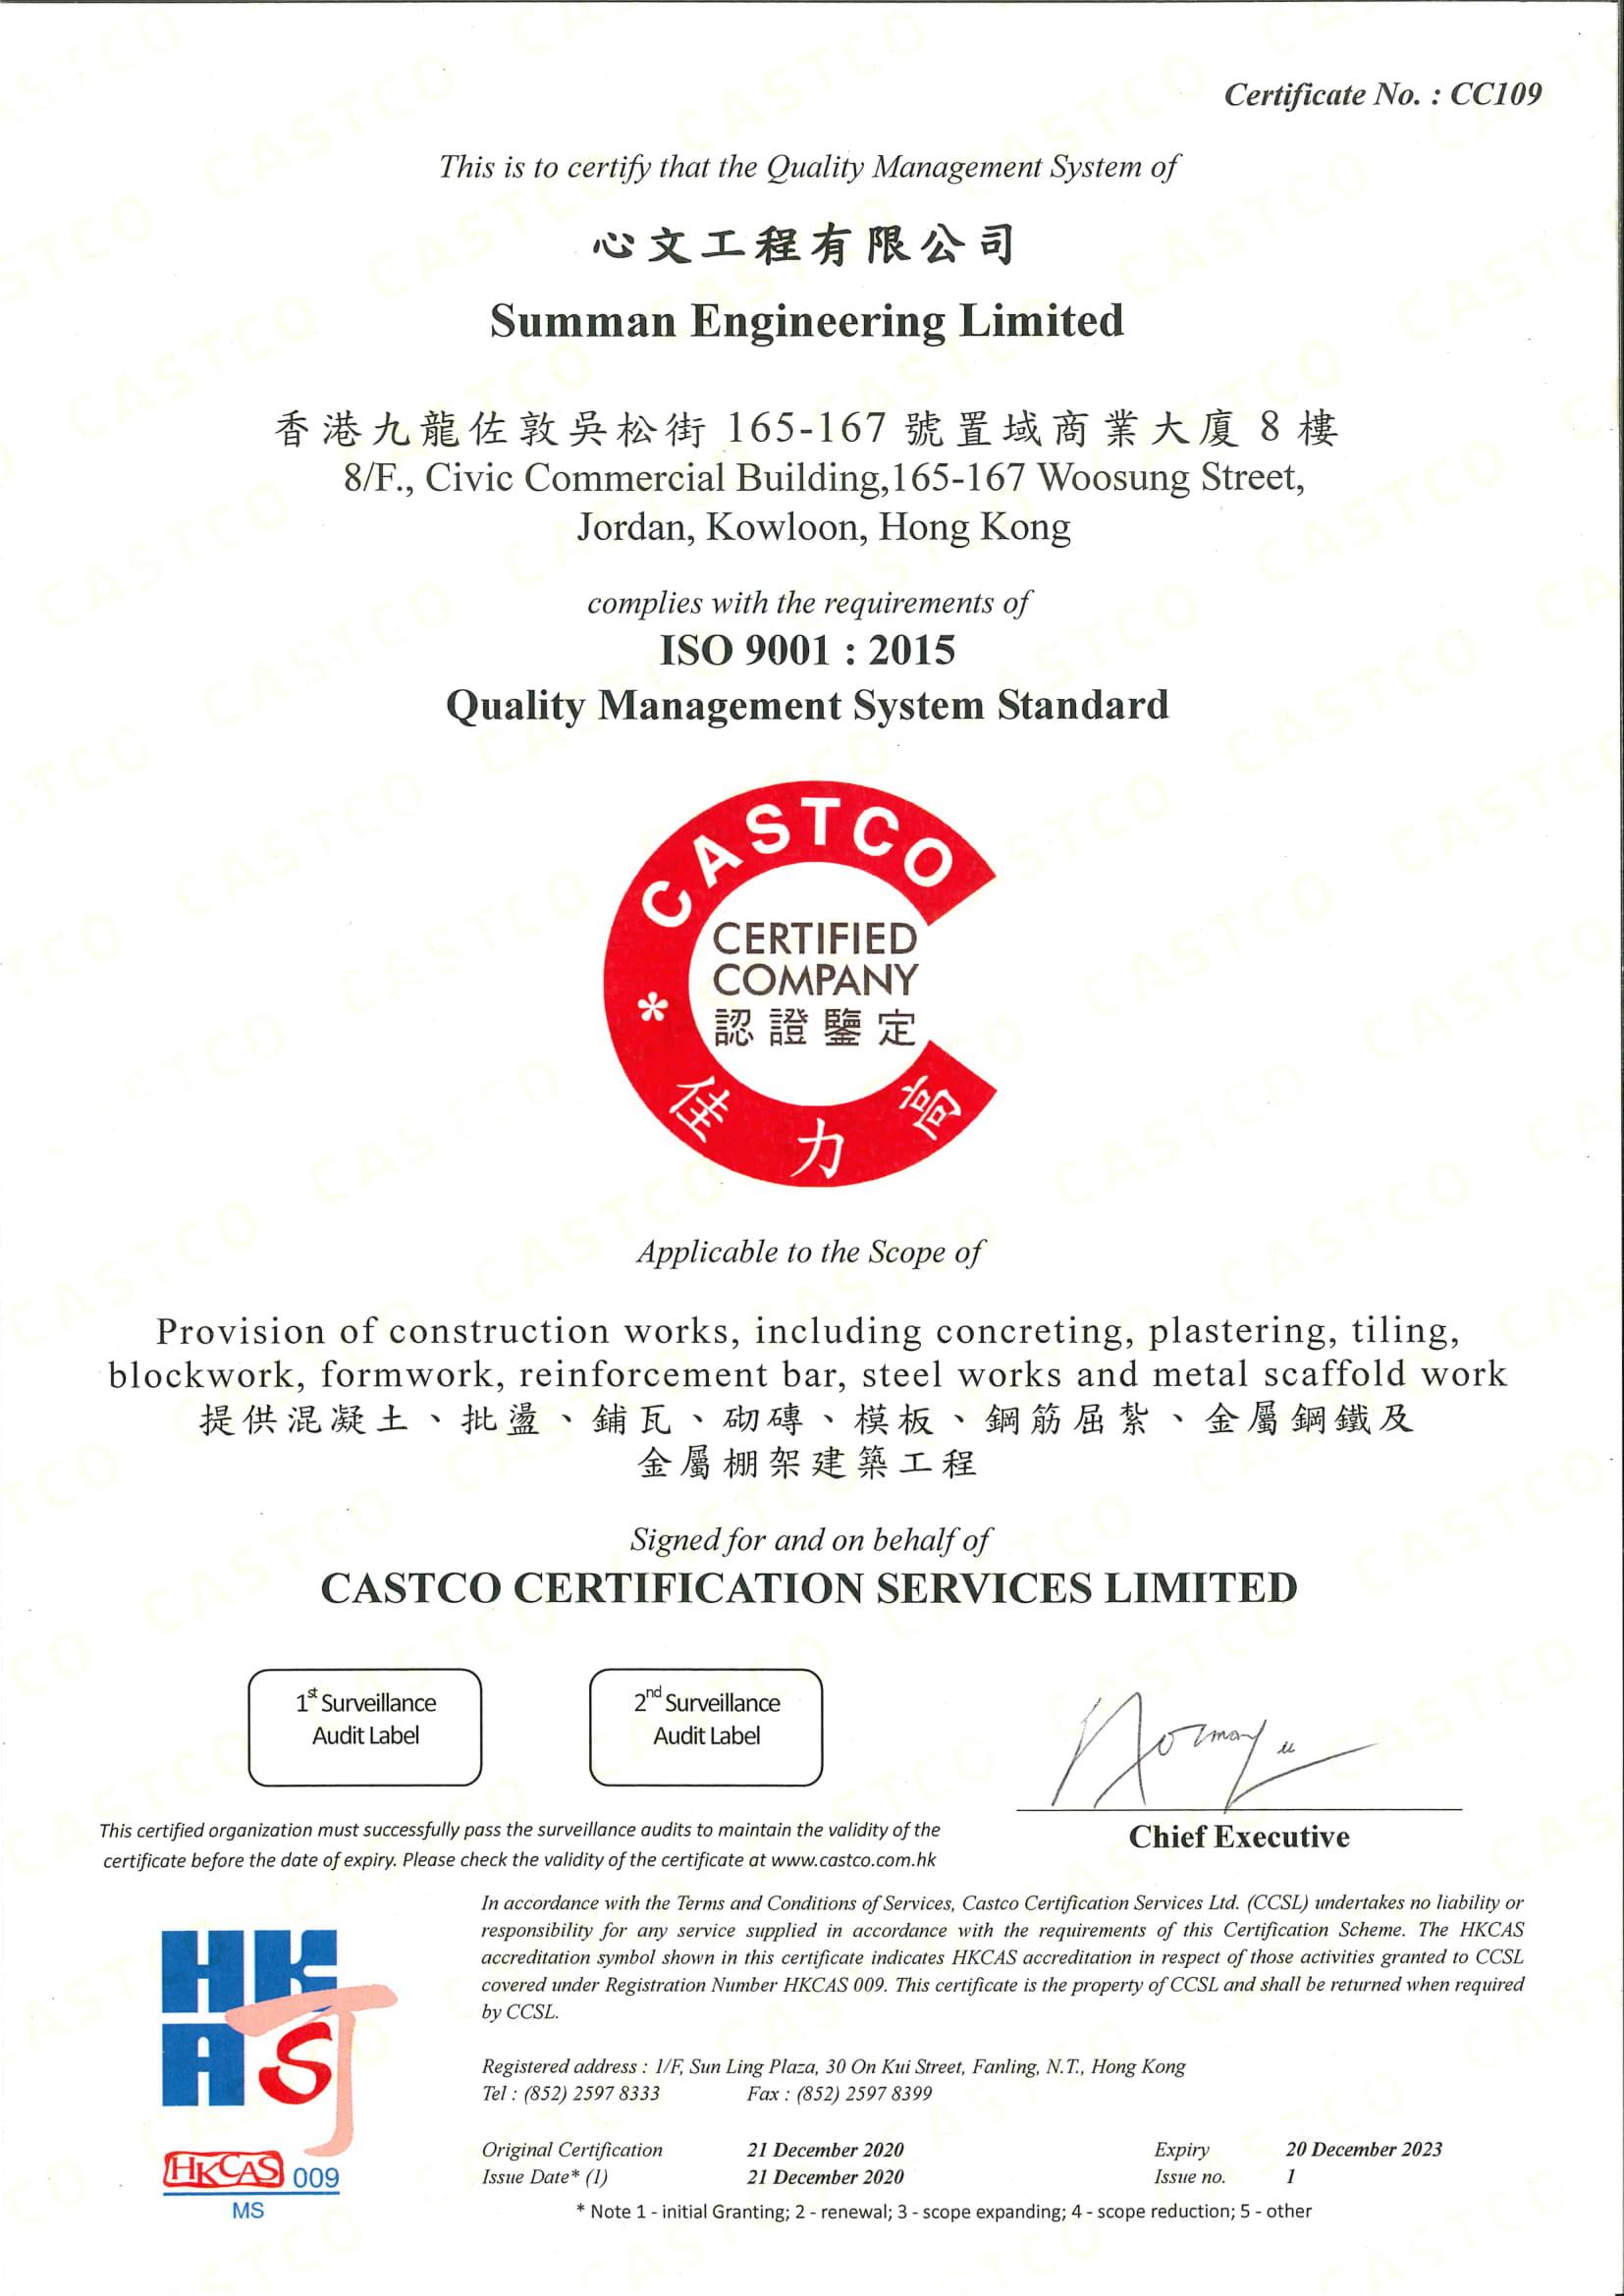 Summan Engineering Limited